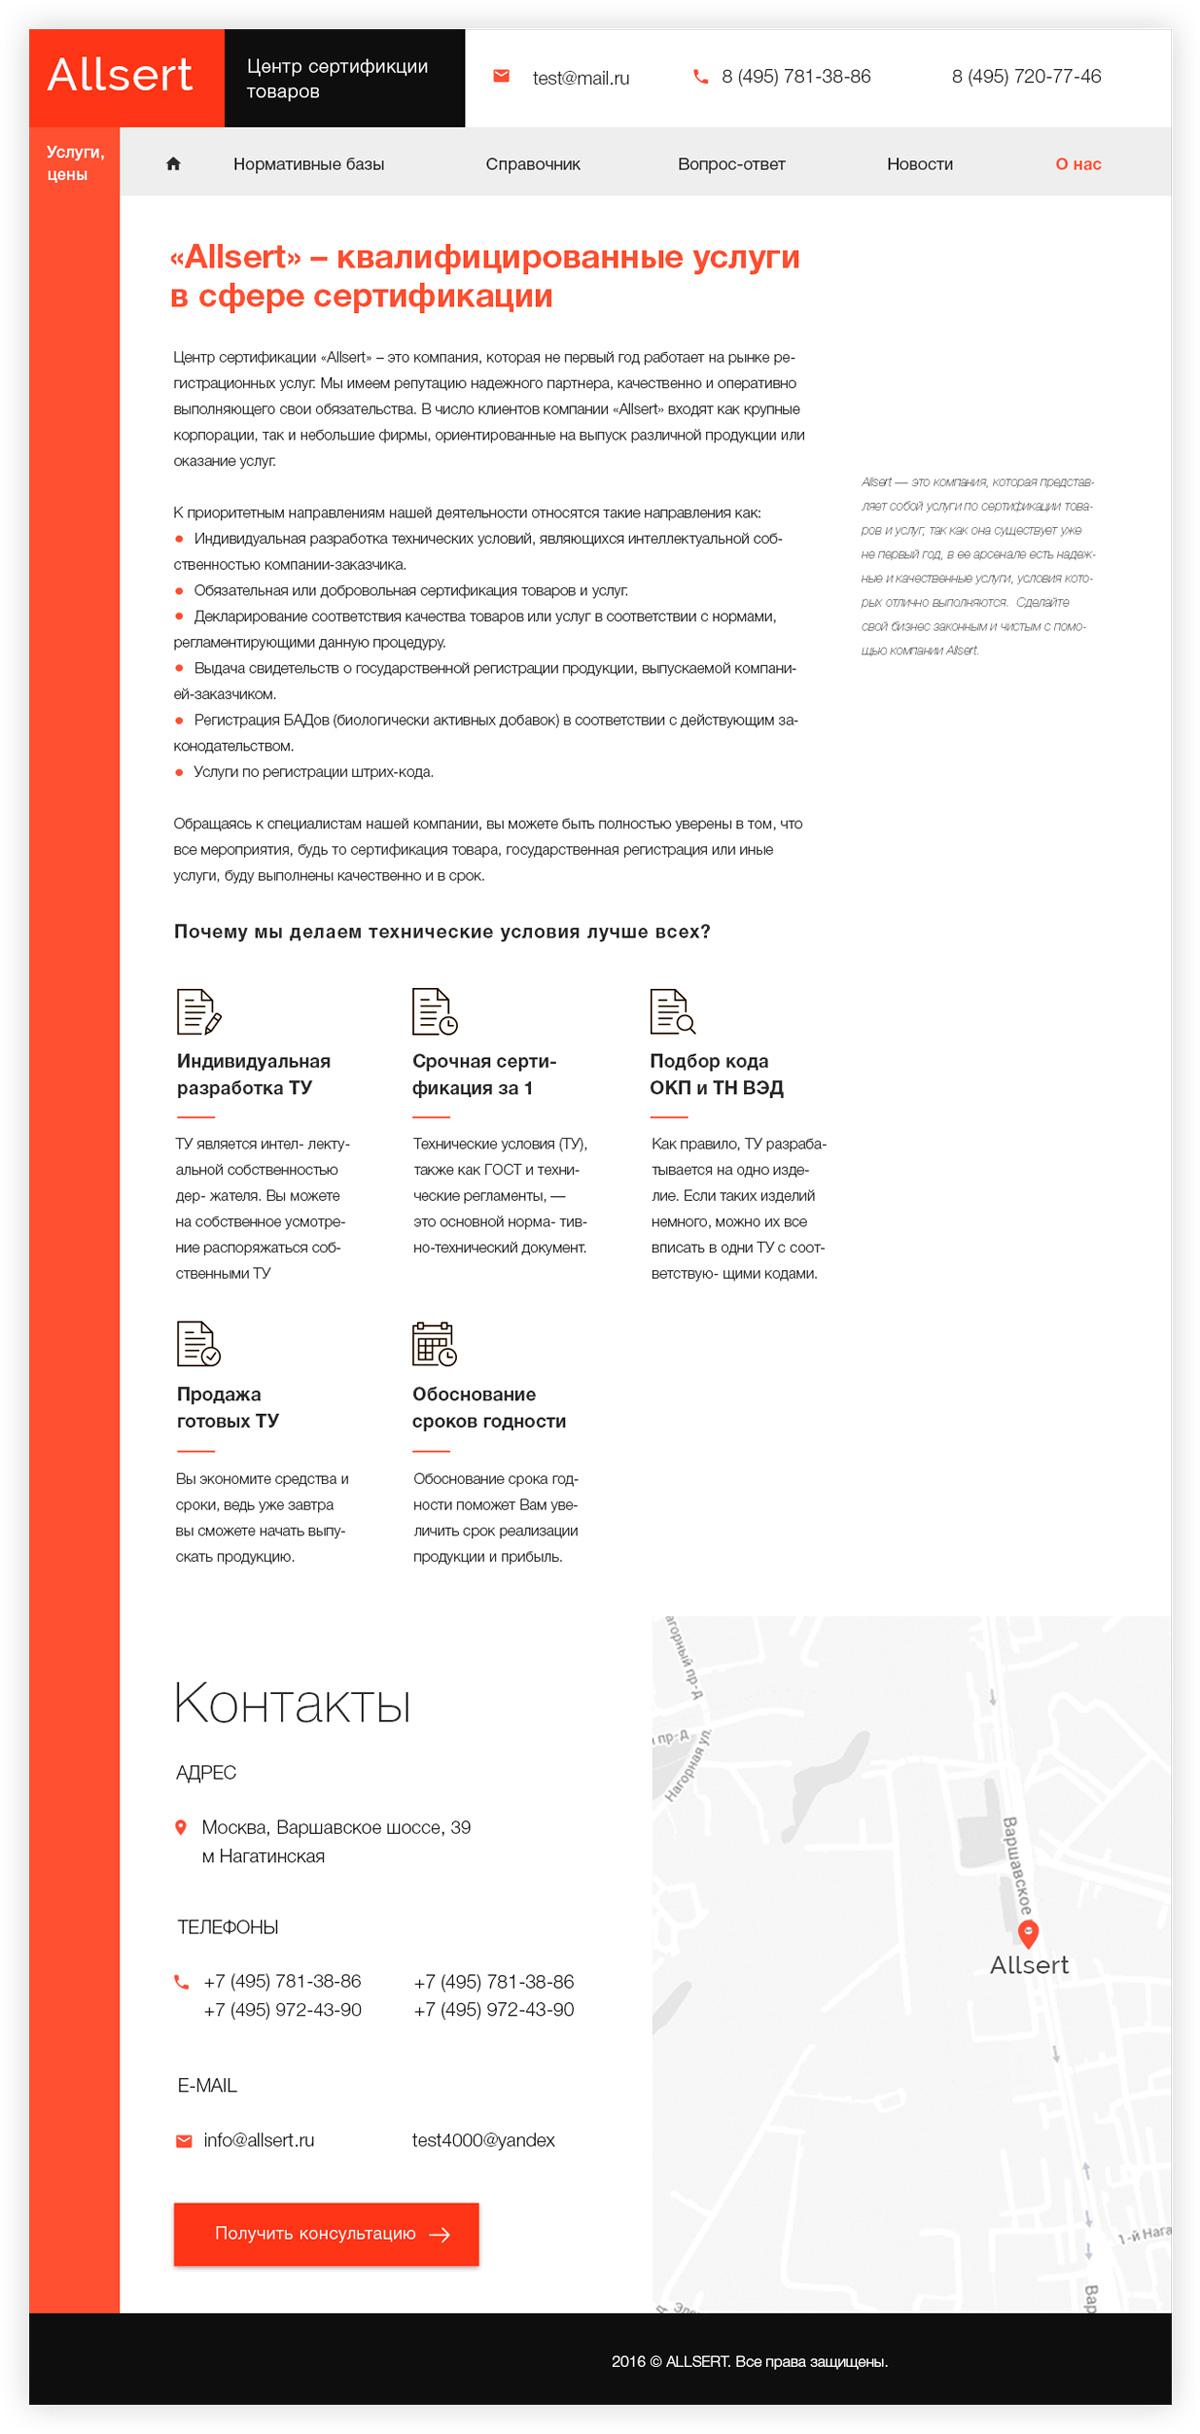 [Корпоративный сайт] Сертификация